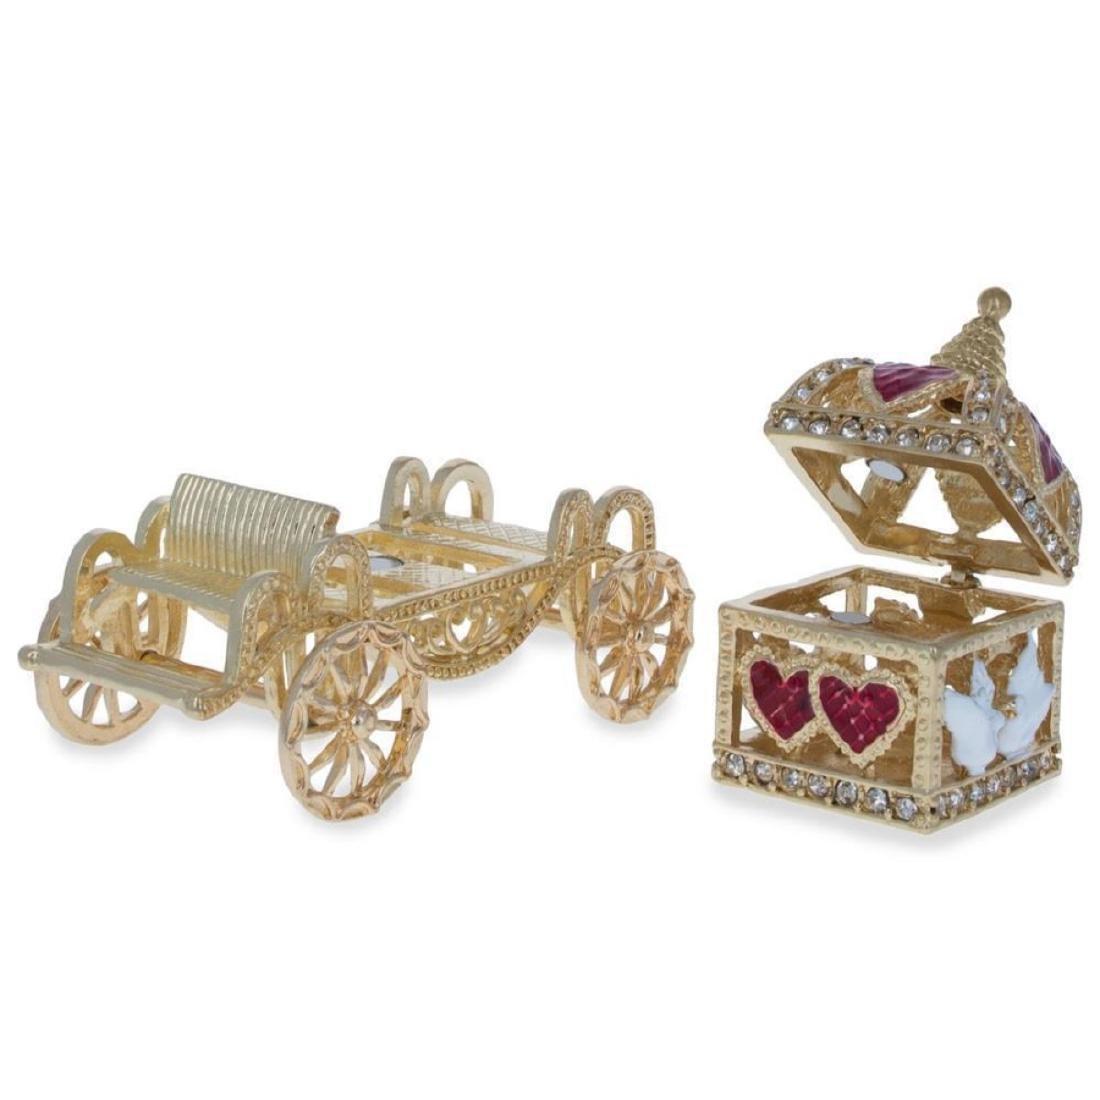 Royal Coronation Coach with Doves Trinket Box Figurine - 3